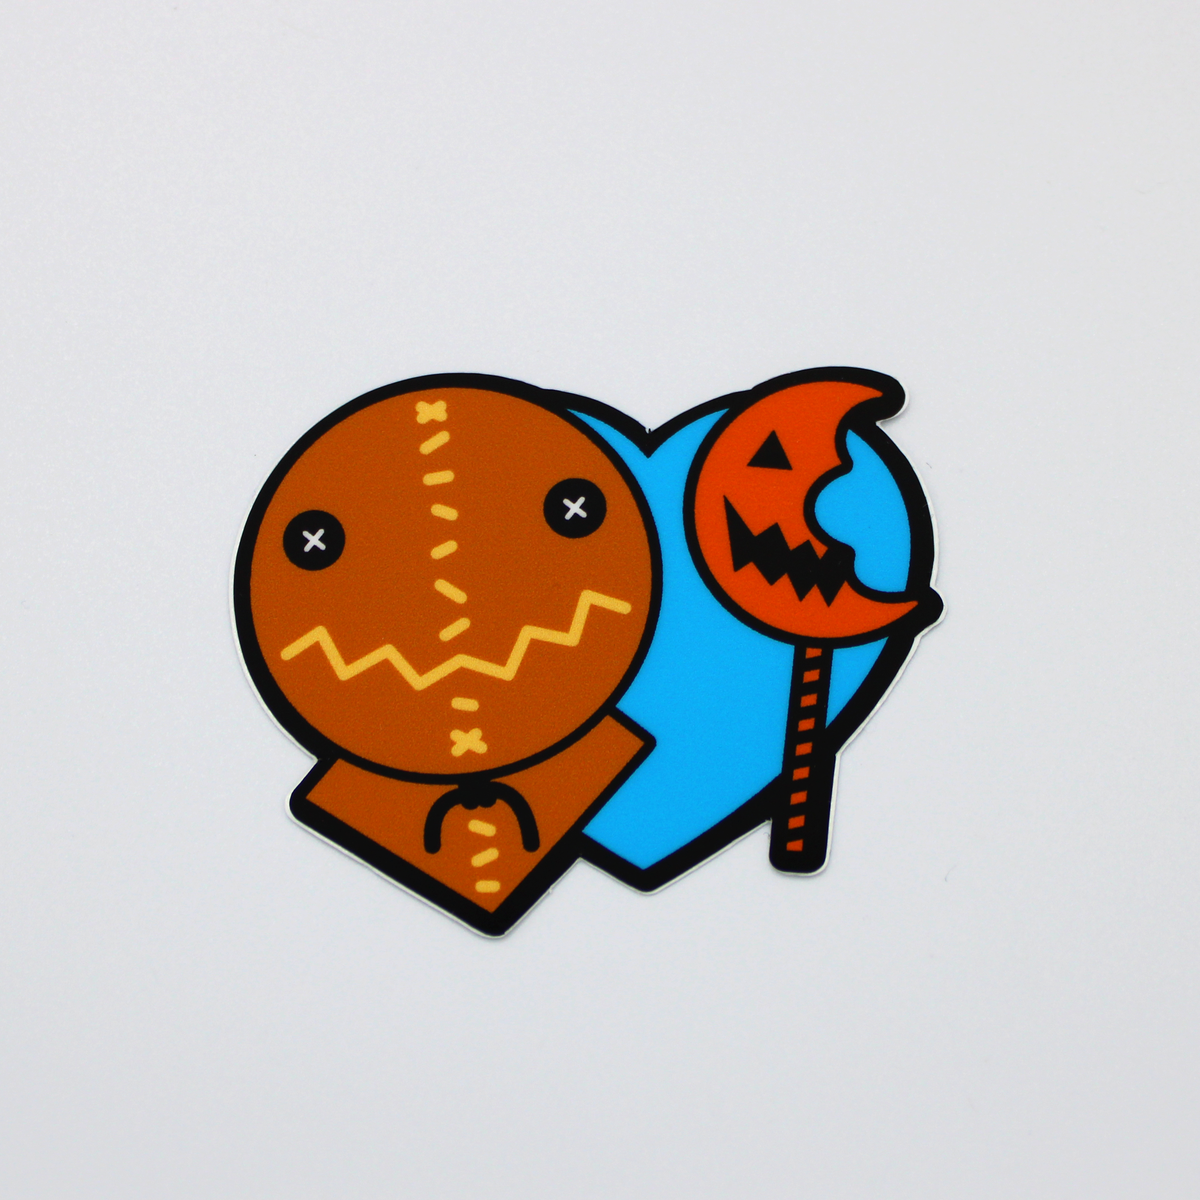 Heart Sam Sticker